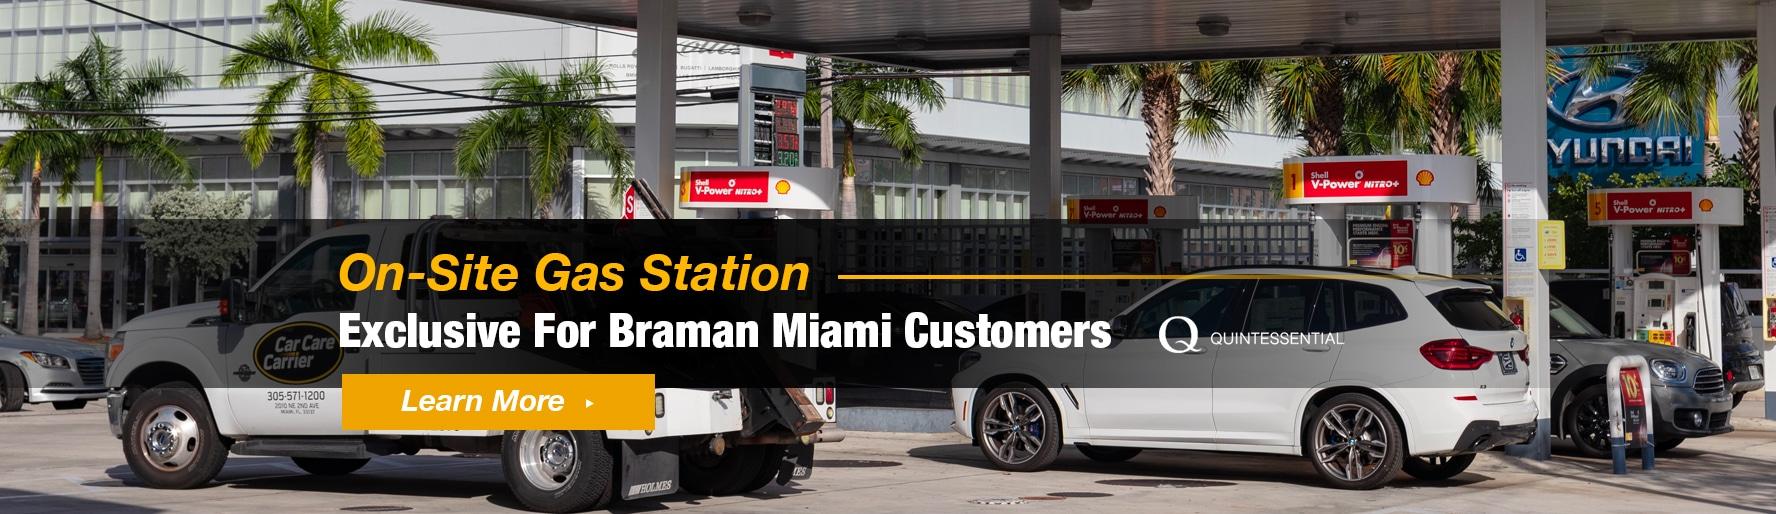 Braman Miami | Car Dealers in Miami, FL | Luxury Car Sales